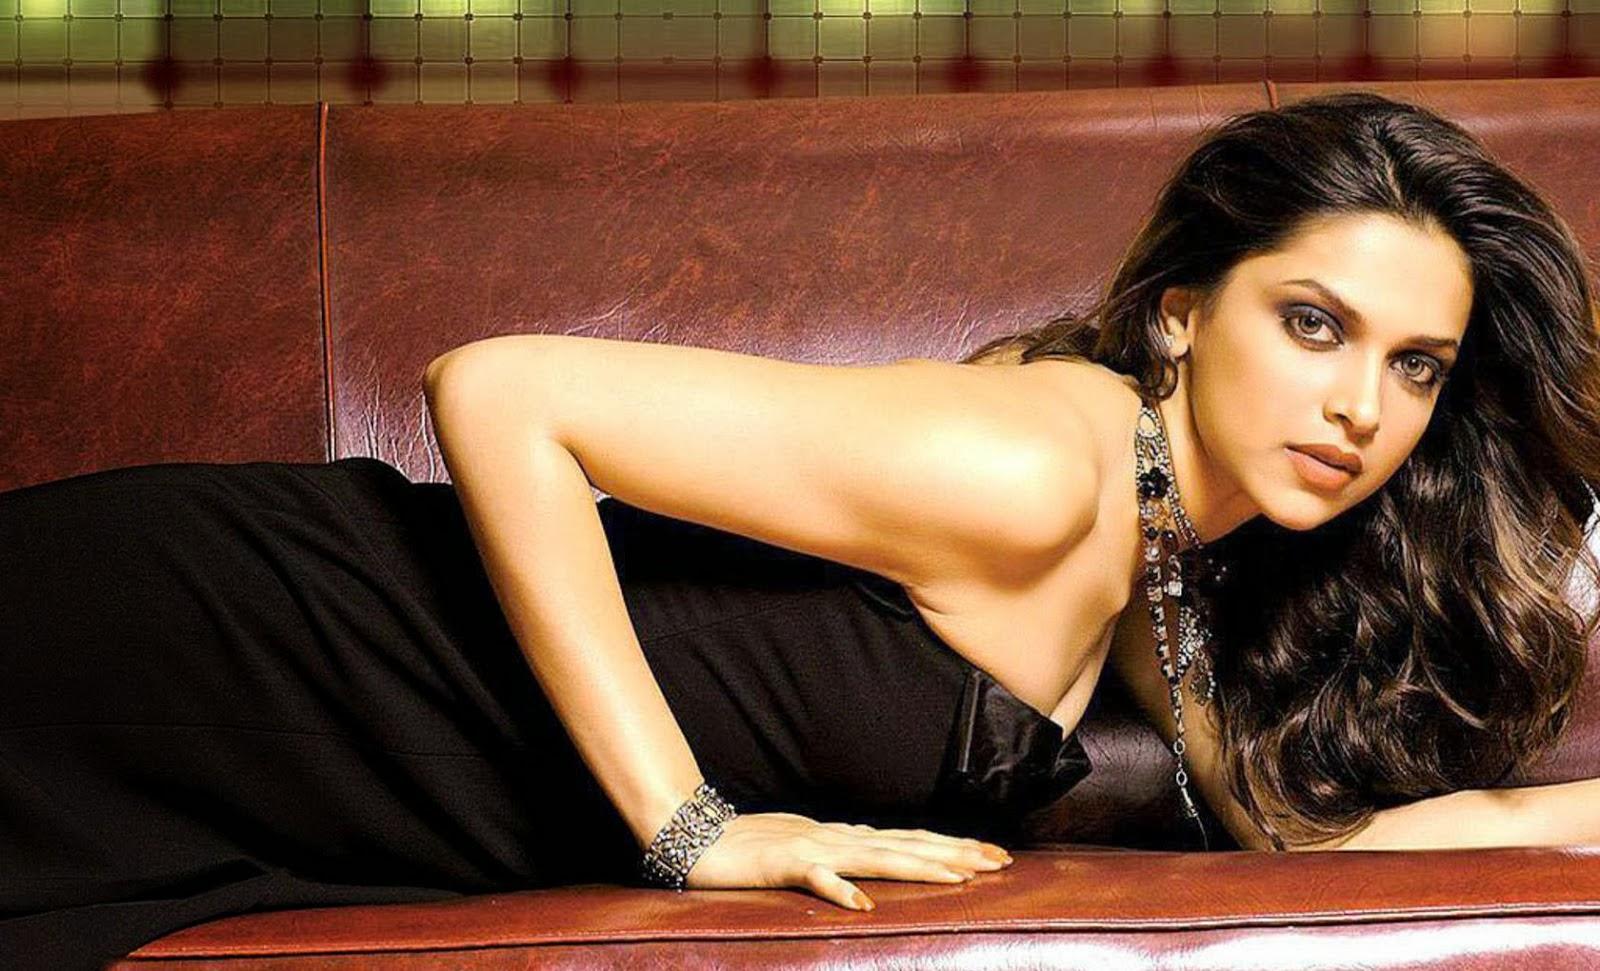 bollywood and hollywood beauti queens,: deepika padukone hot hd